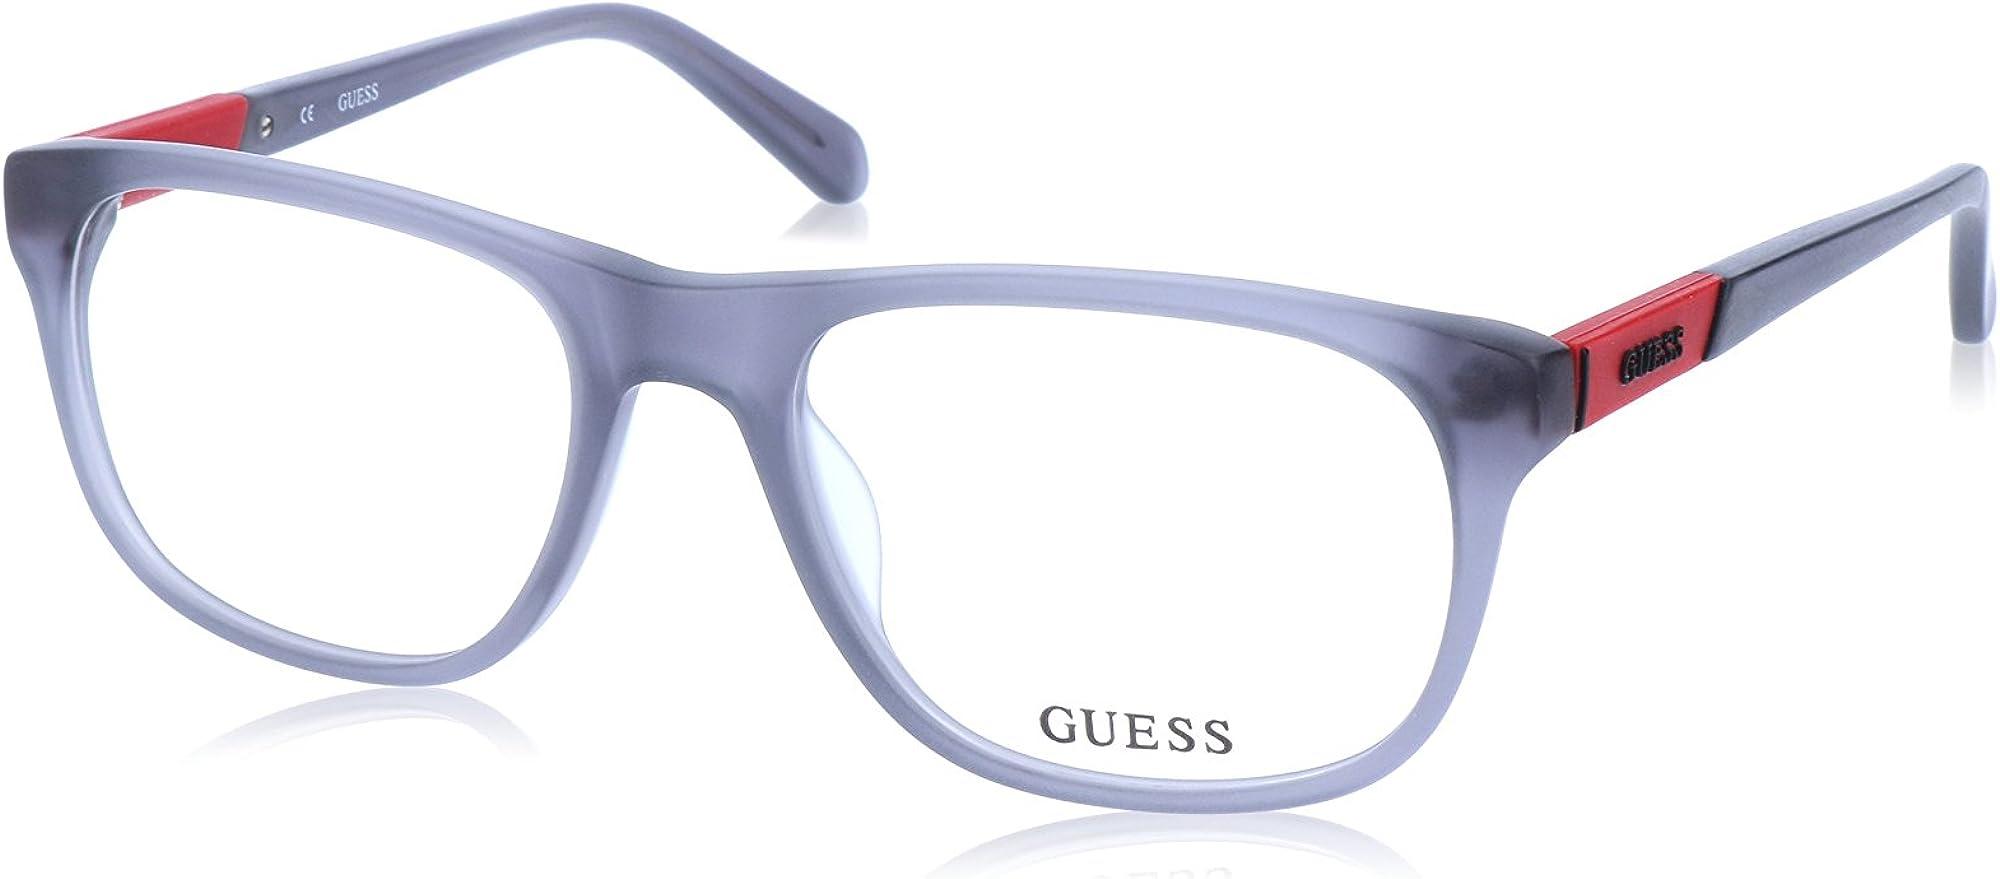 GUESS Eyeglasses GU 2333 Purple 52MM